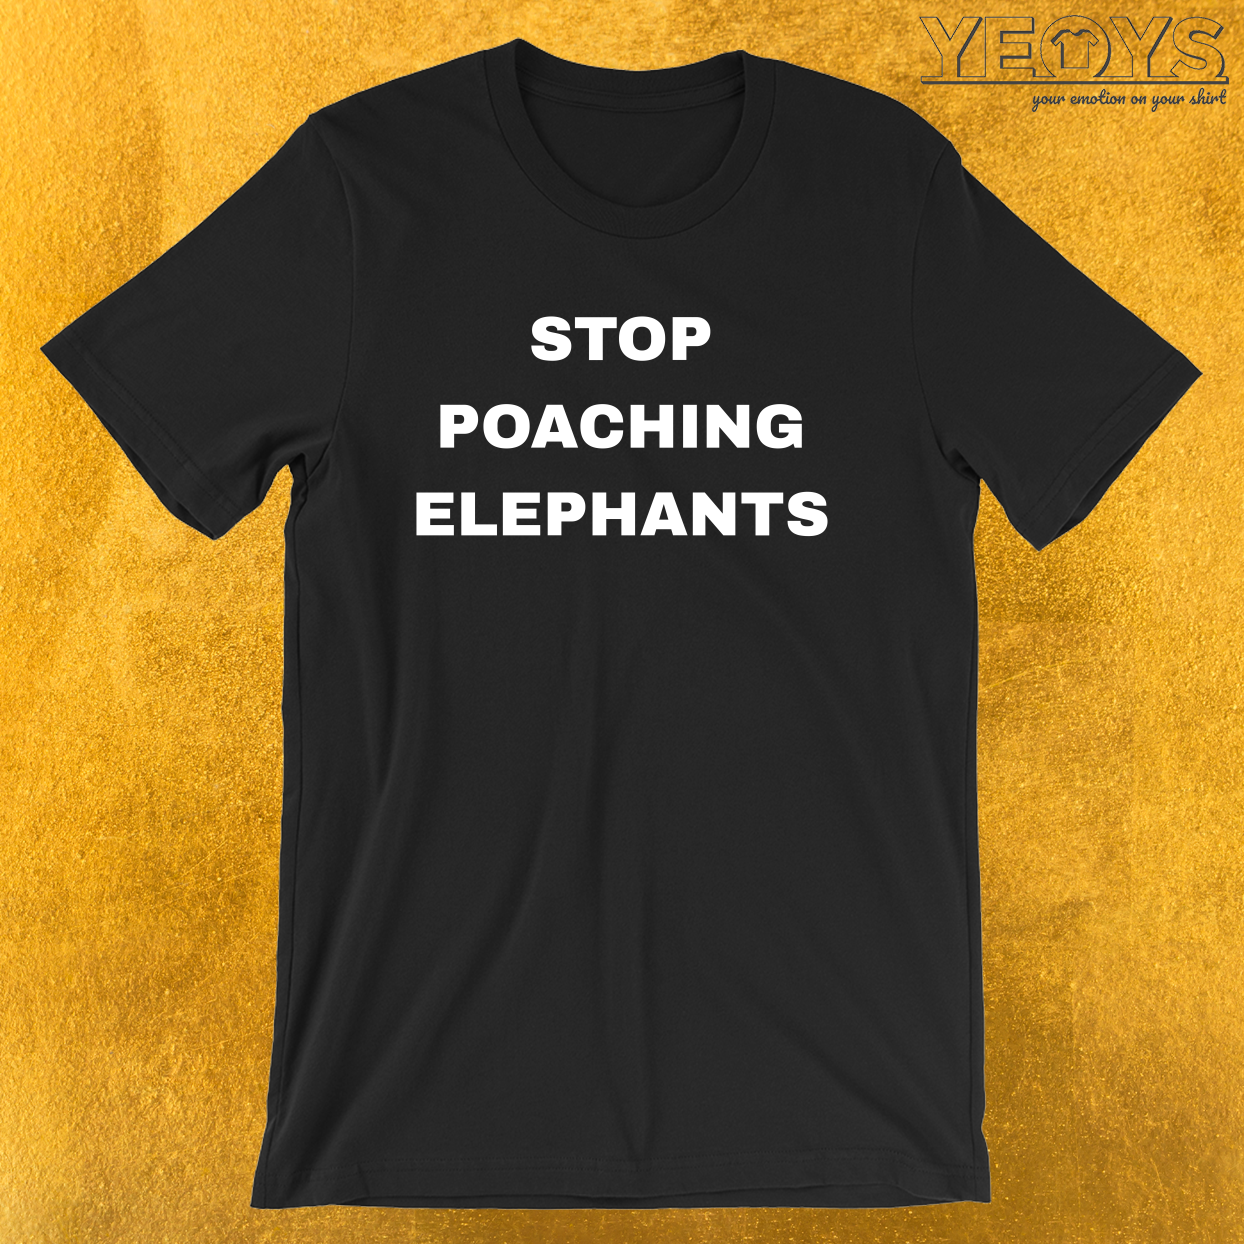 Stop Poaching Elephants – Stop Poaching Tee